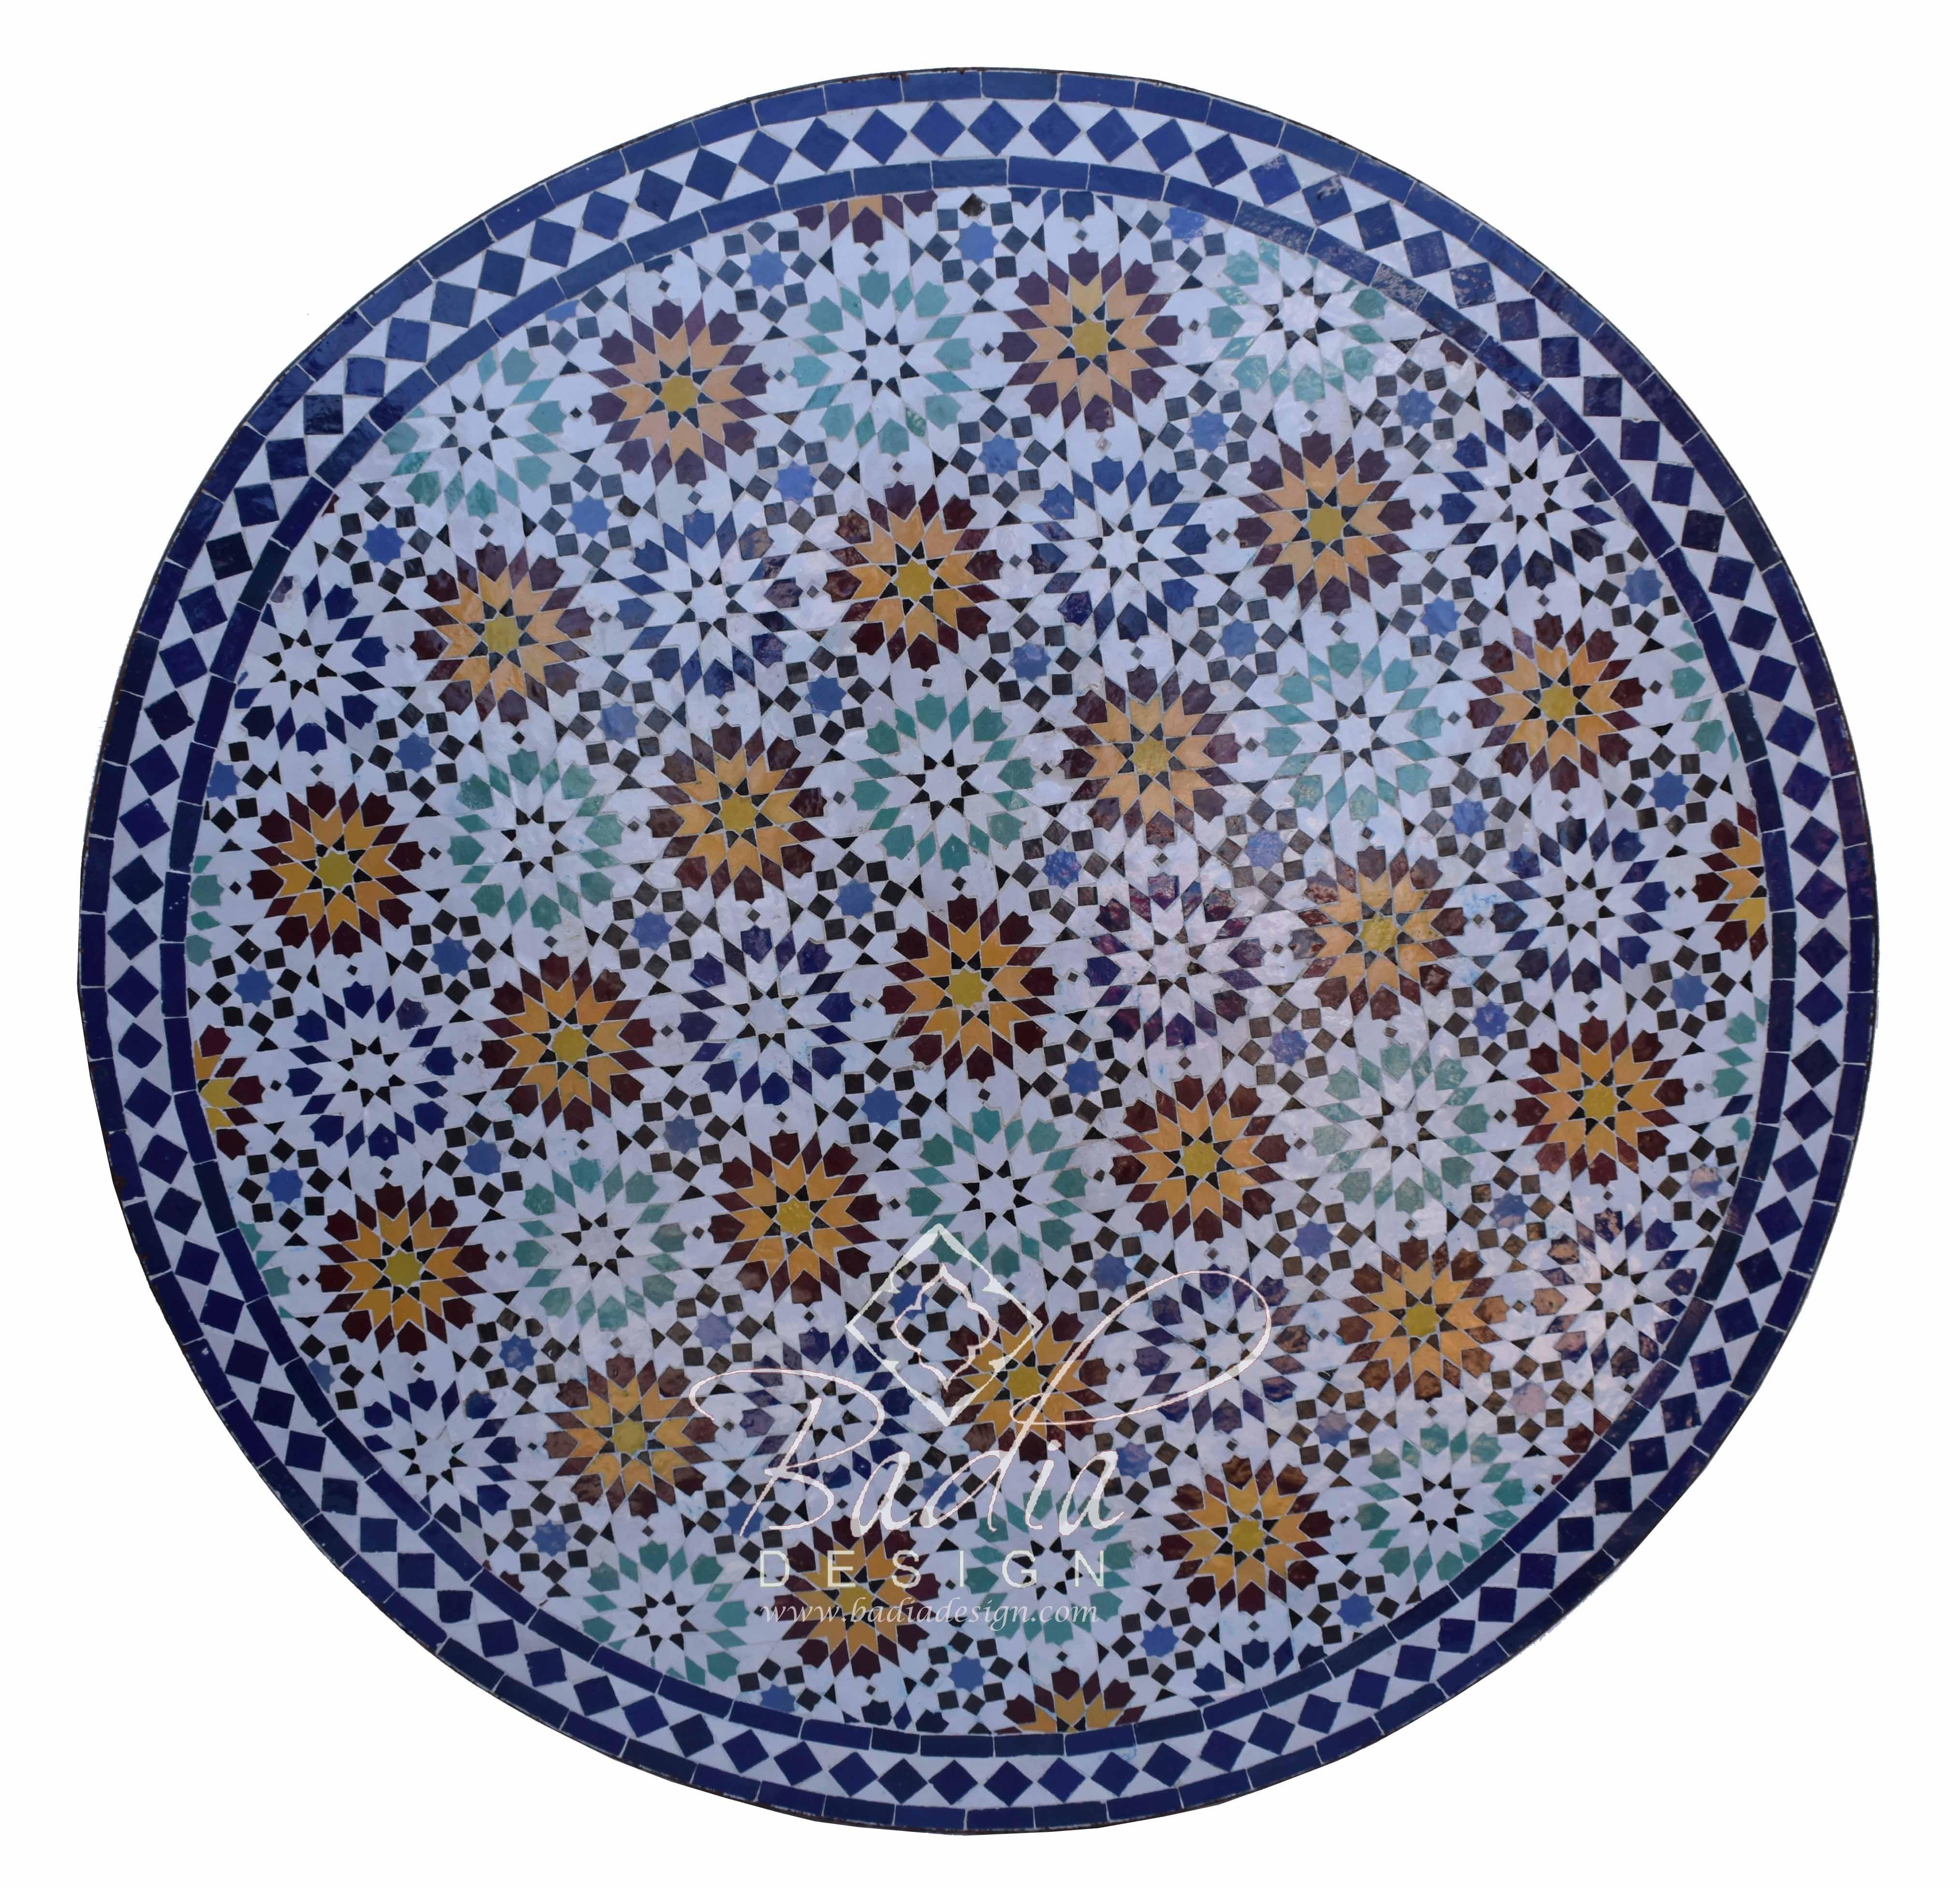 multi-color-moroccan-mosaic-tile-table-top-mtr429.jpg